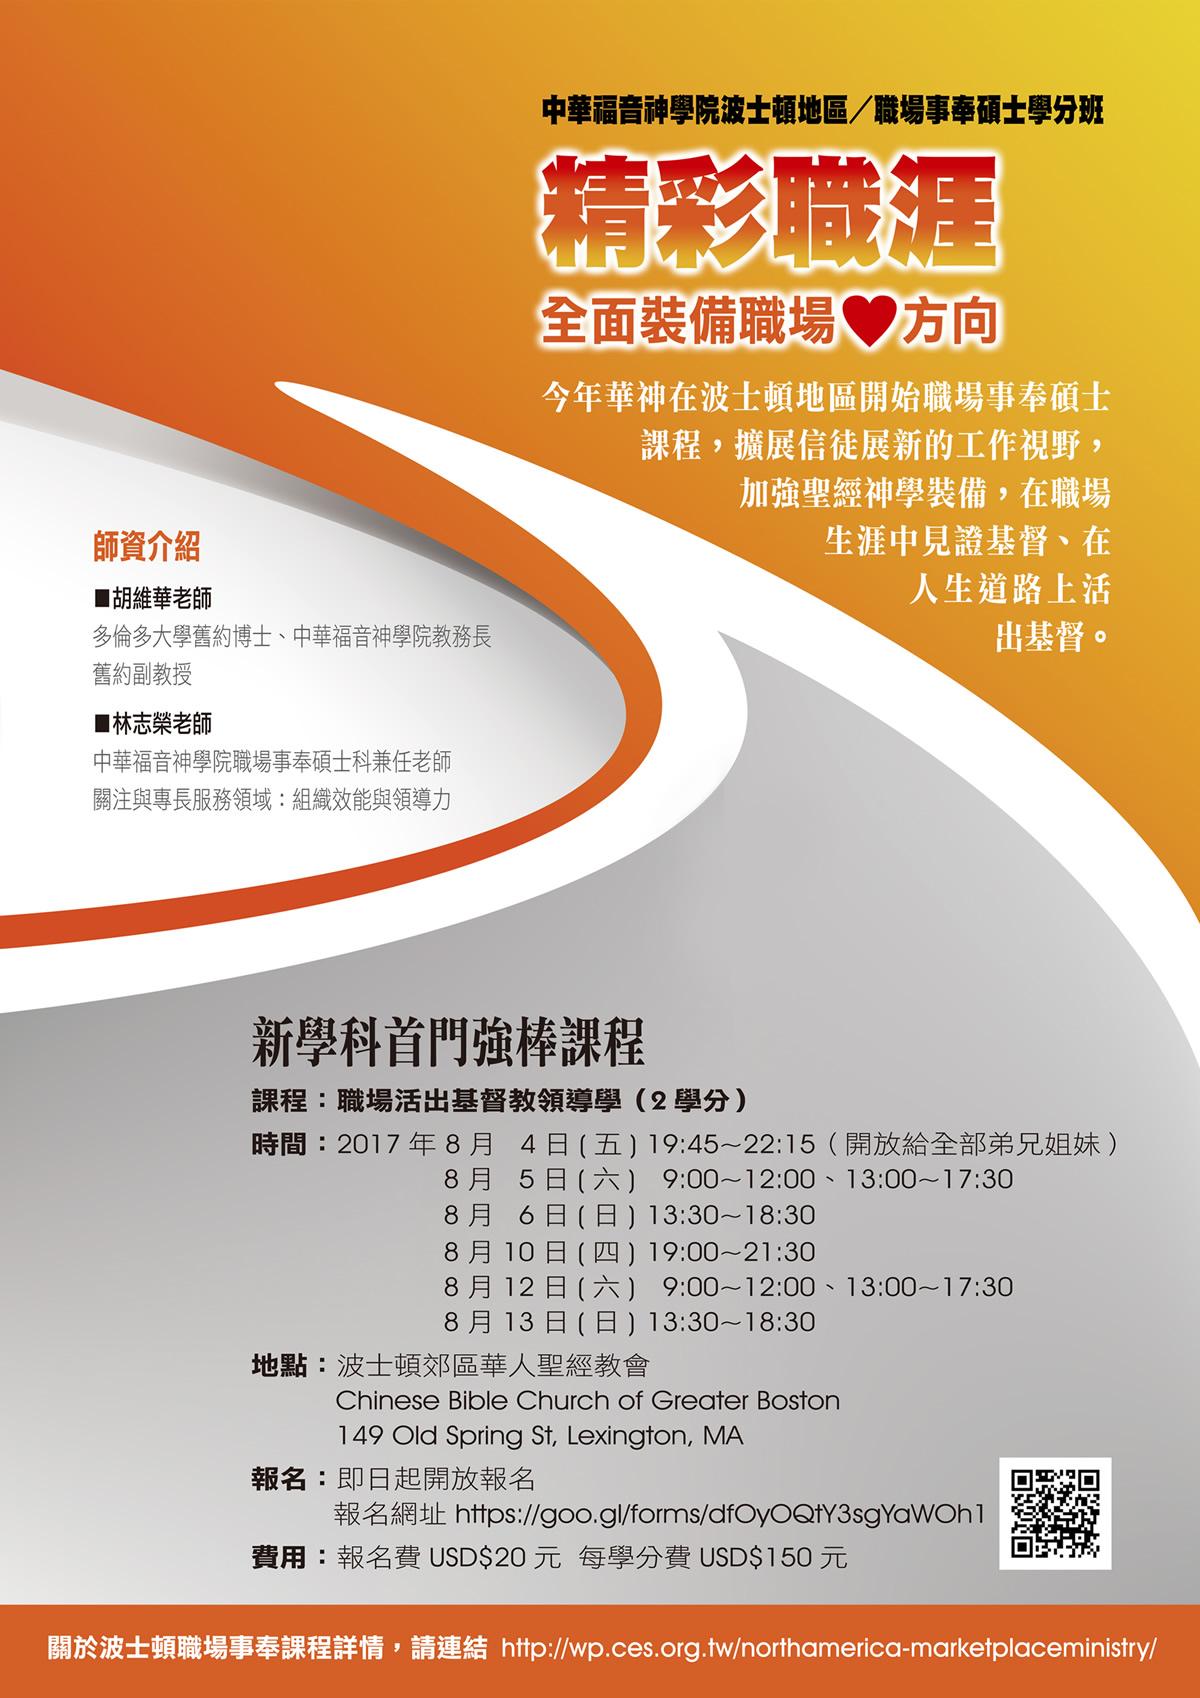 2017-08-04 __ 頓課程_Poster